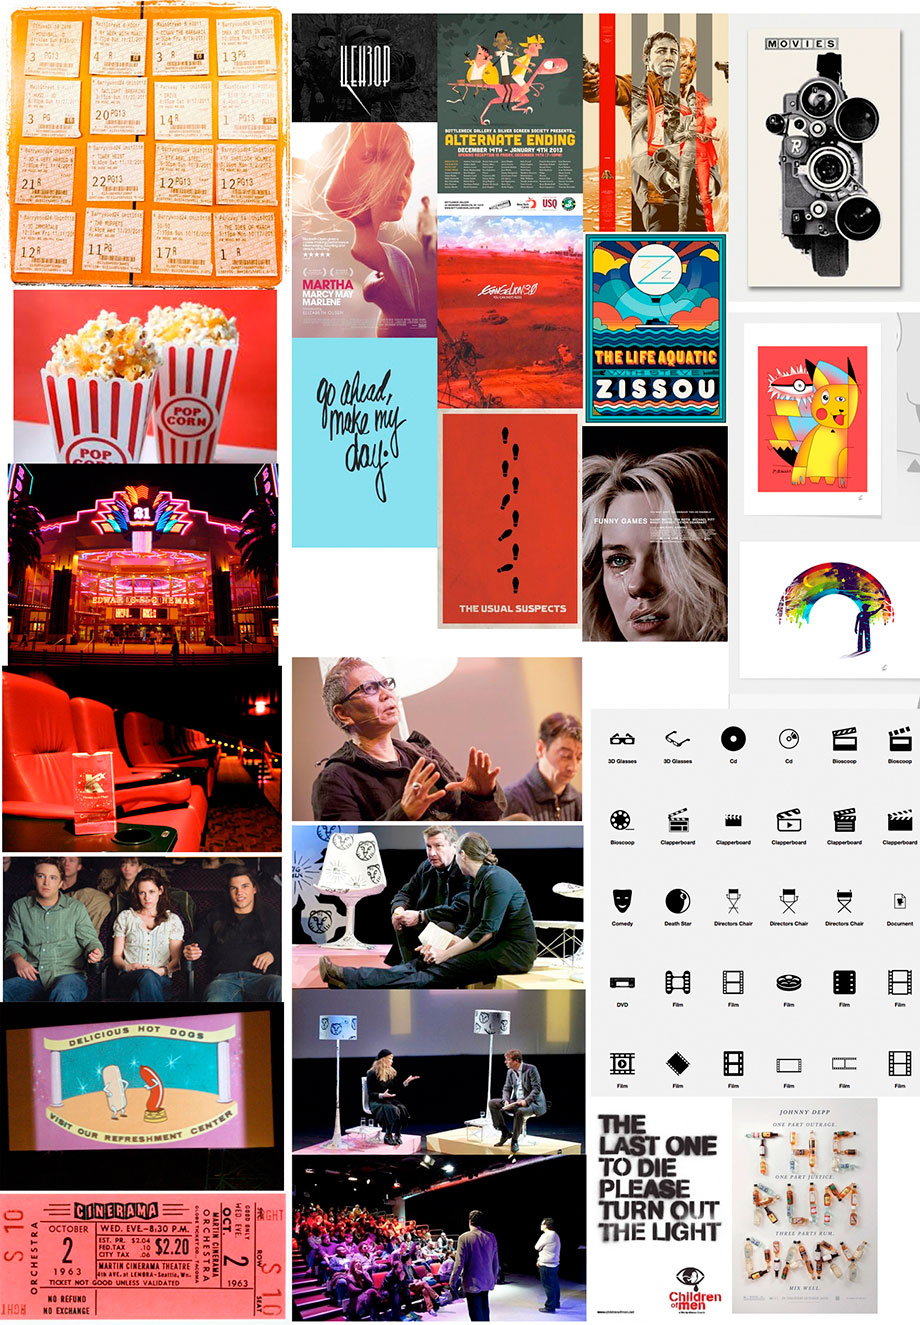 Popcorn Preken - image 2 - student project